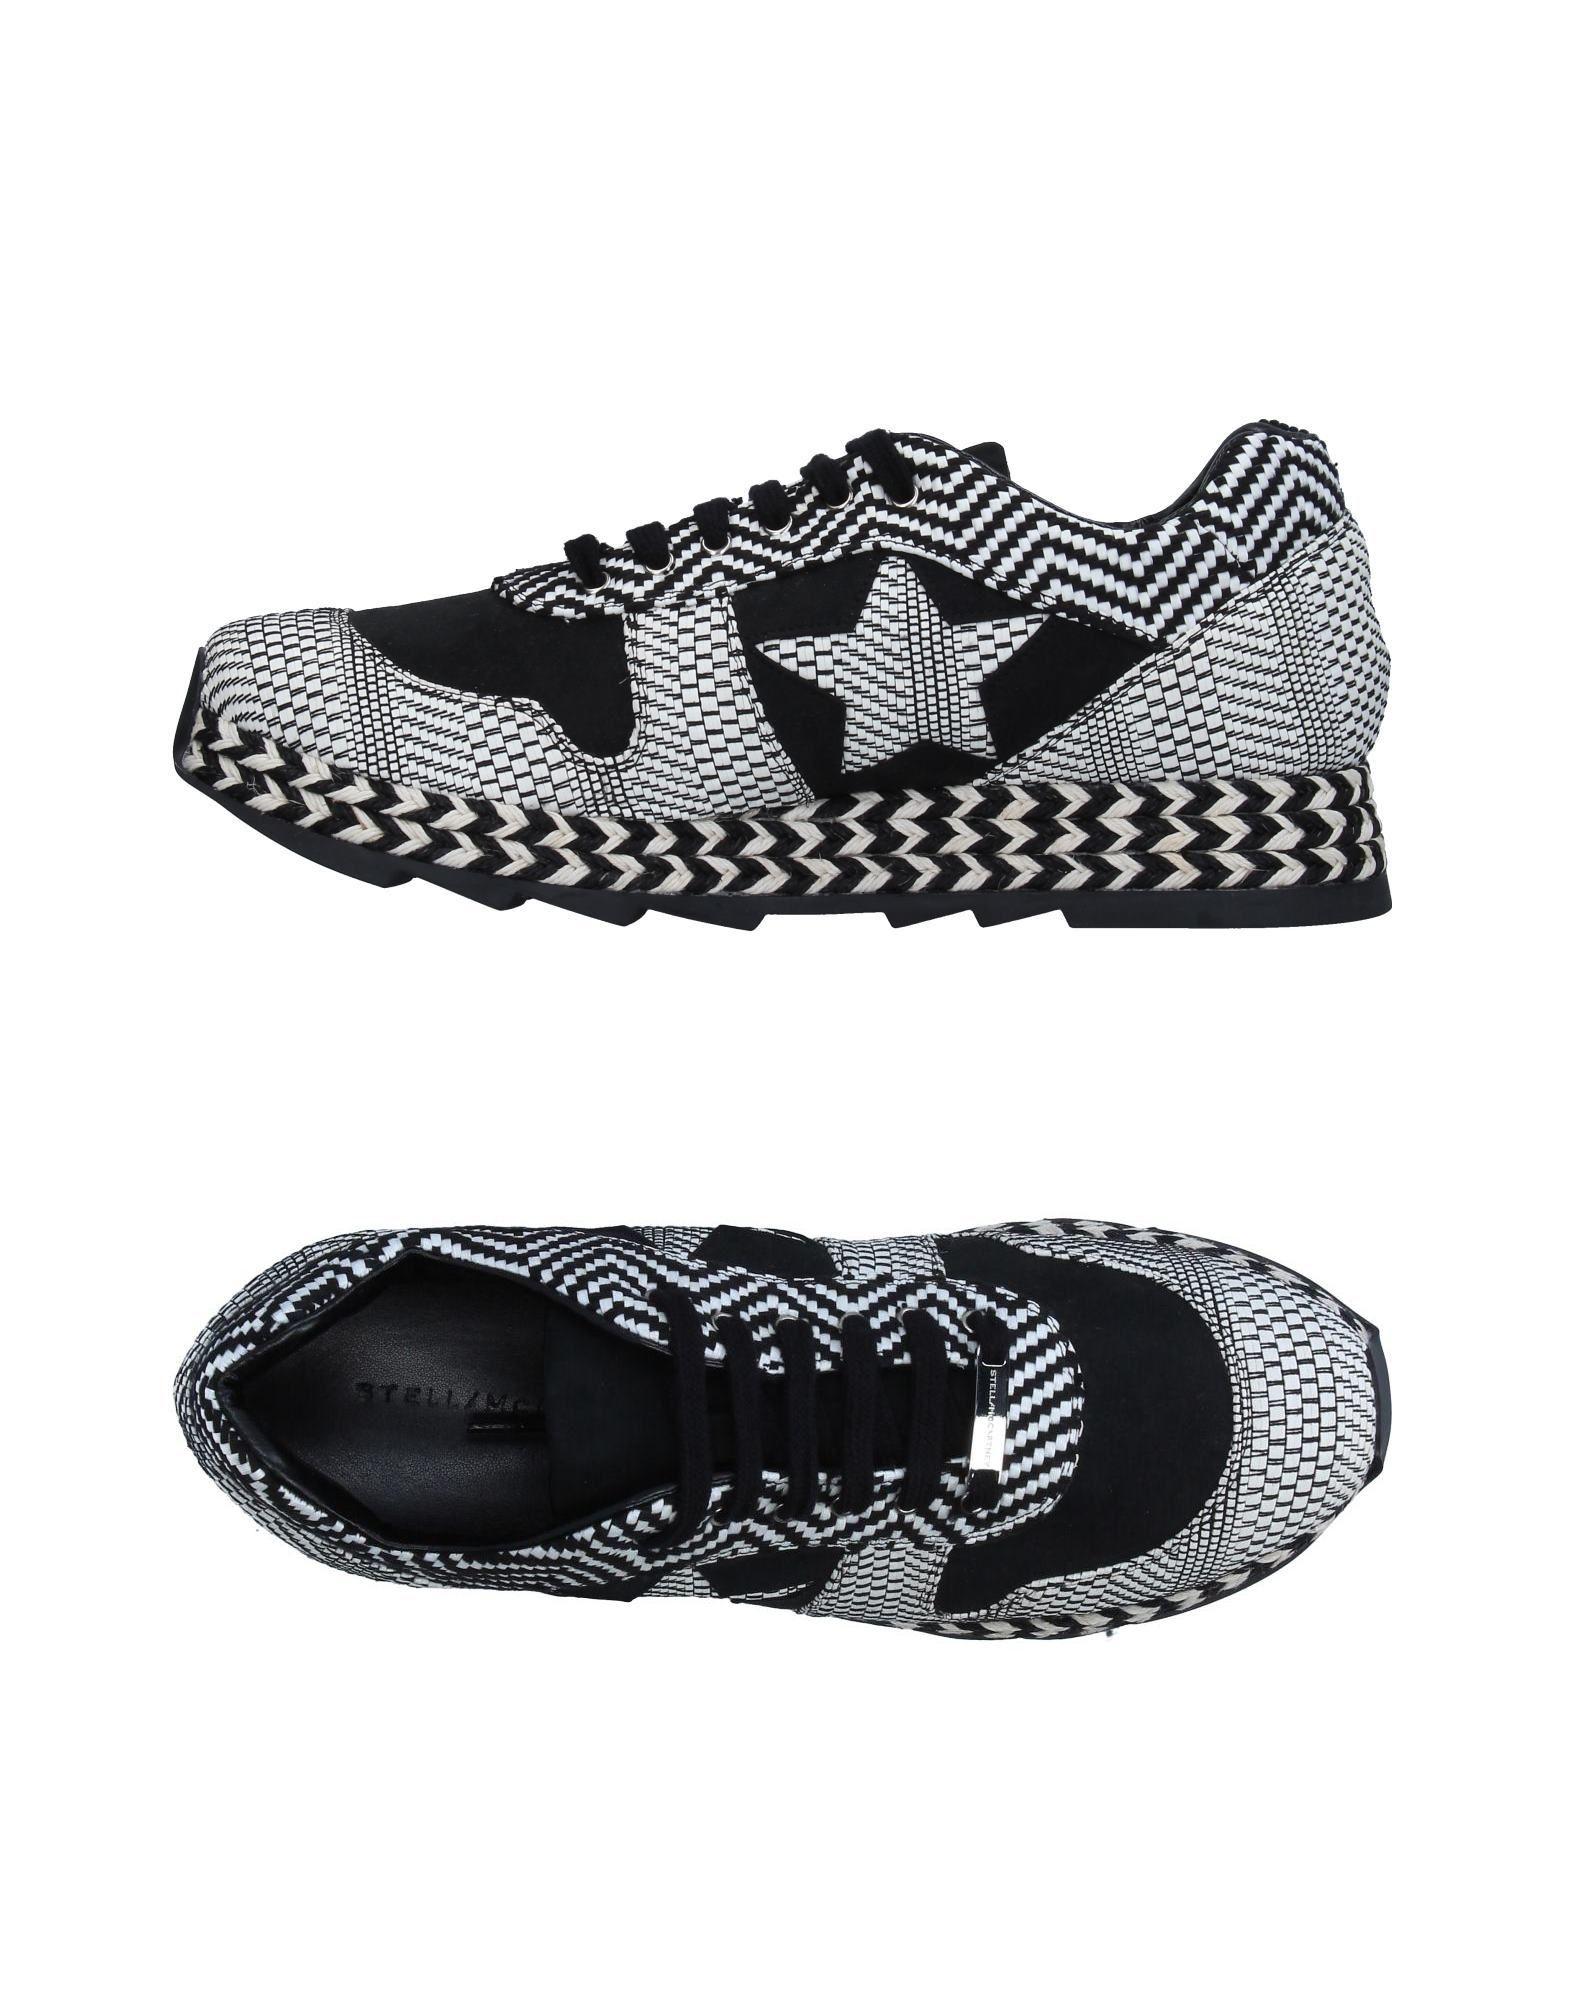 Zapatillas Stella Mccartney Mujer - Stella Zapatillas Stella - Mccartney  Blanco bcf22f